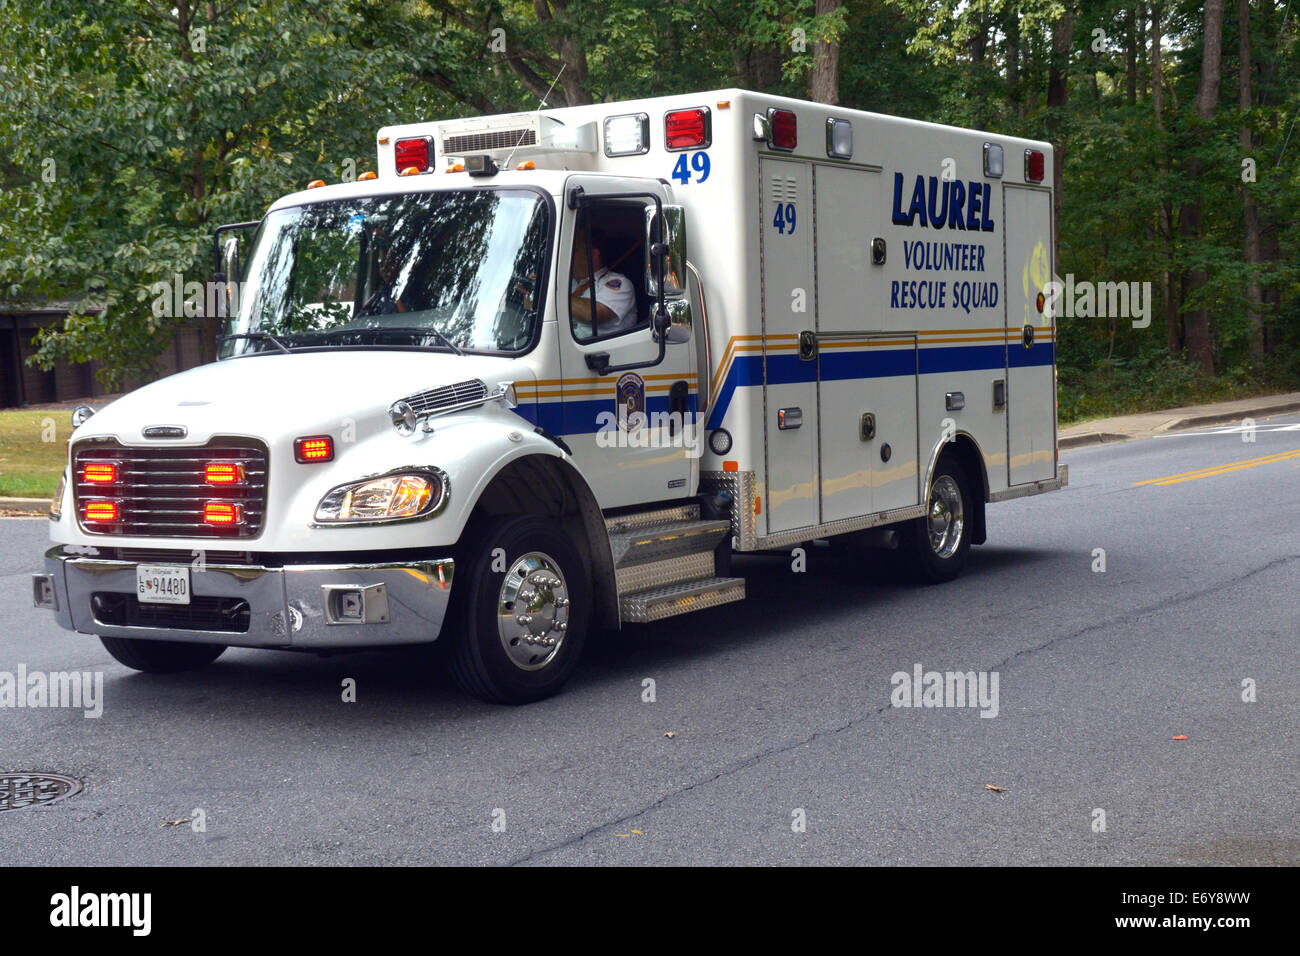 Laurel Volunteer Rescie Squad ambulance - Stock Image